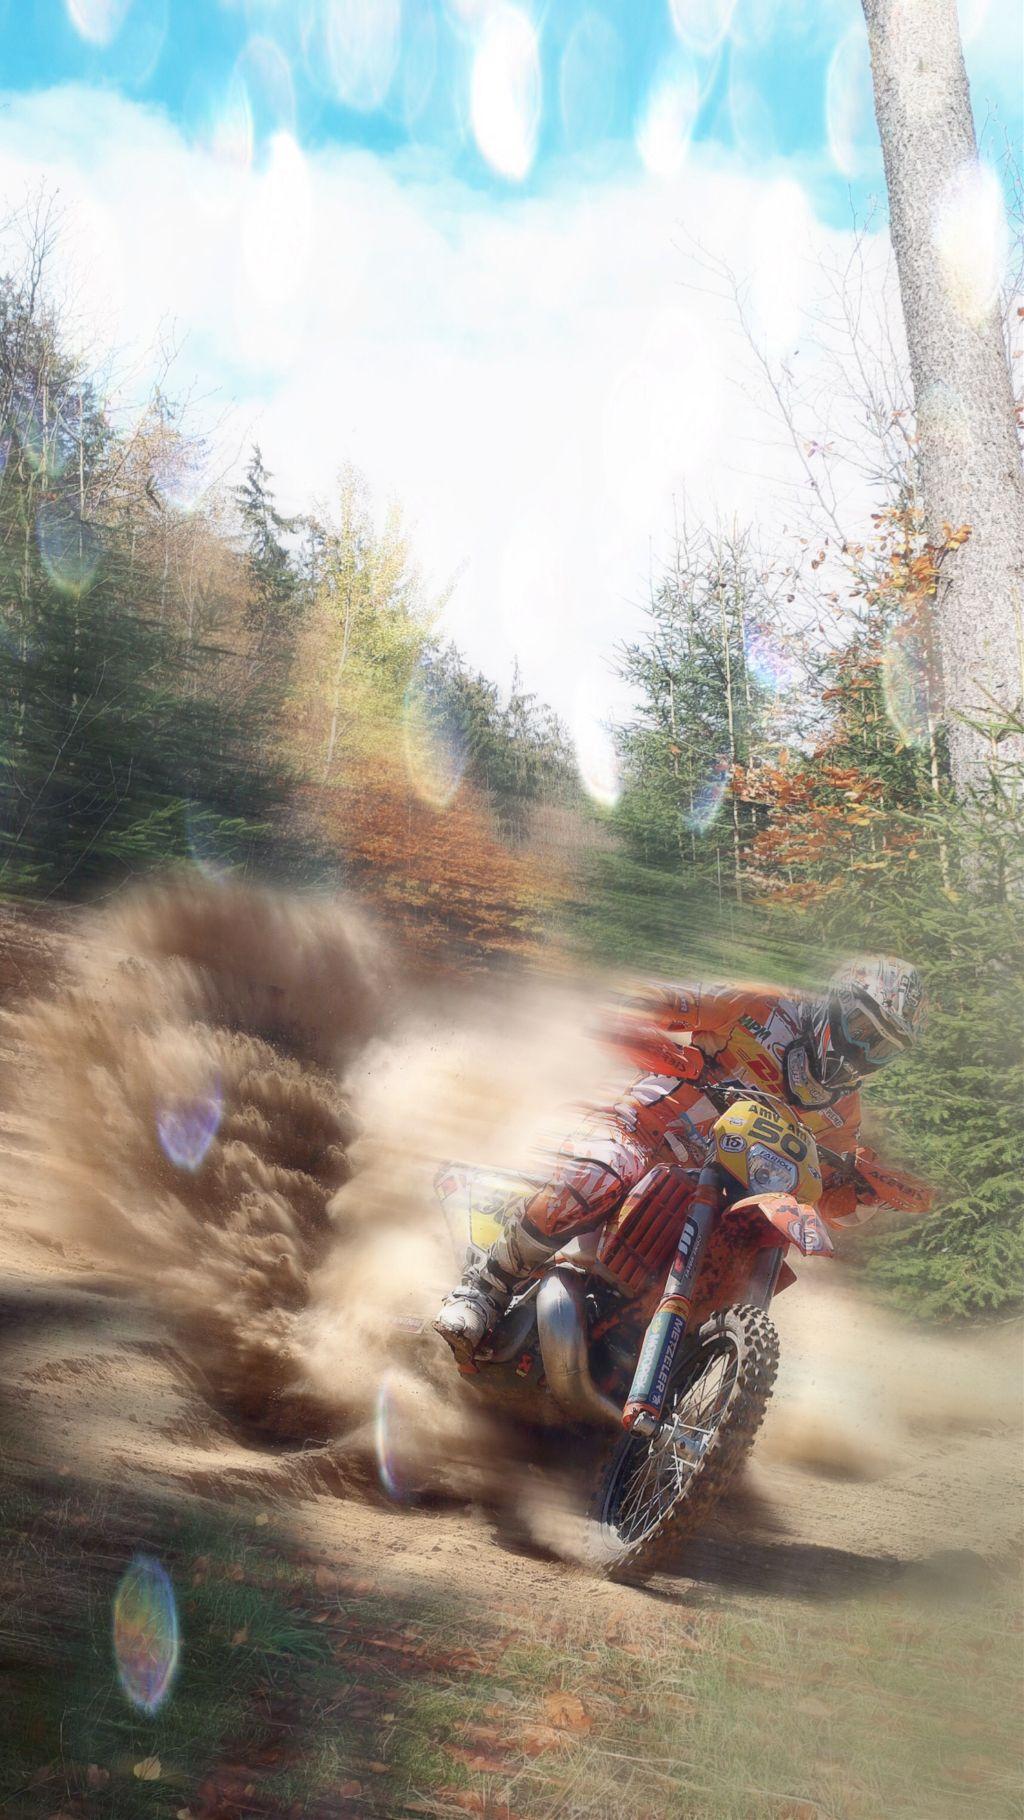 #freetoedit #motorcycle #ktm #dust #mask #motocross #doubleexposure #picsarteffects #picsart motorcyclist from bing